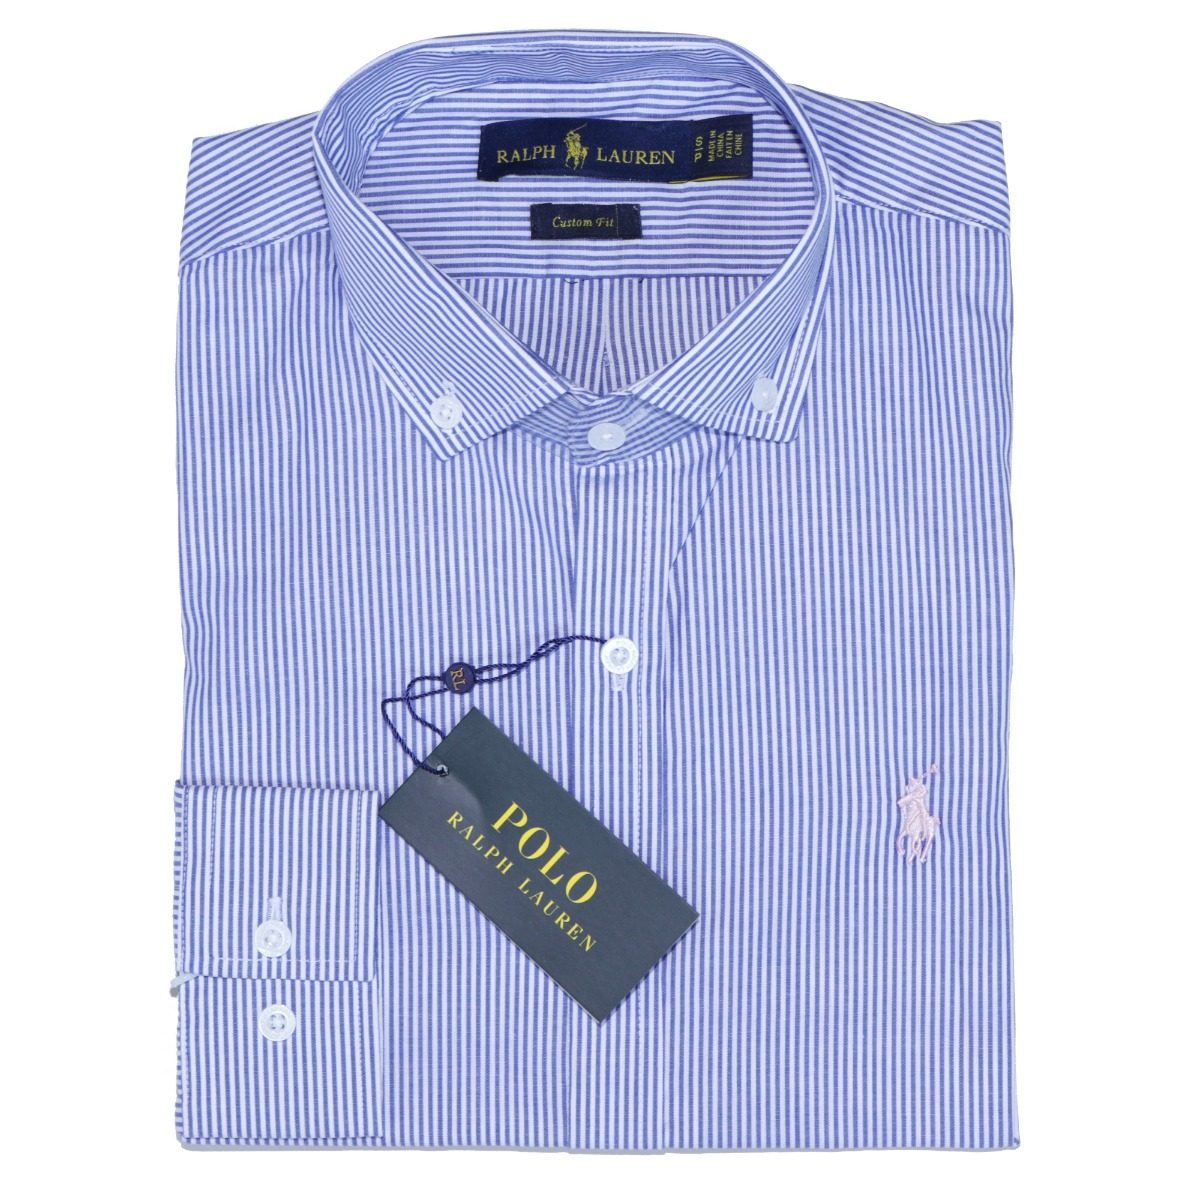 camisa social ralph lauren masc listrada c fit azul original. Carregando  zoom. 650b22bef9b